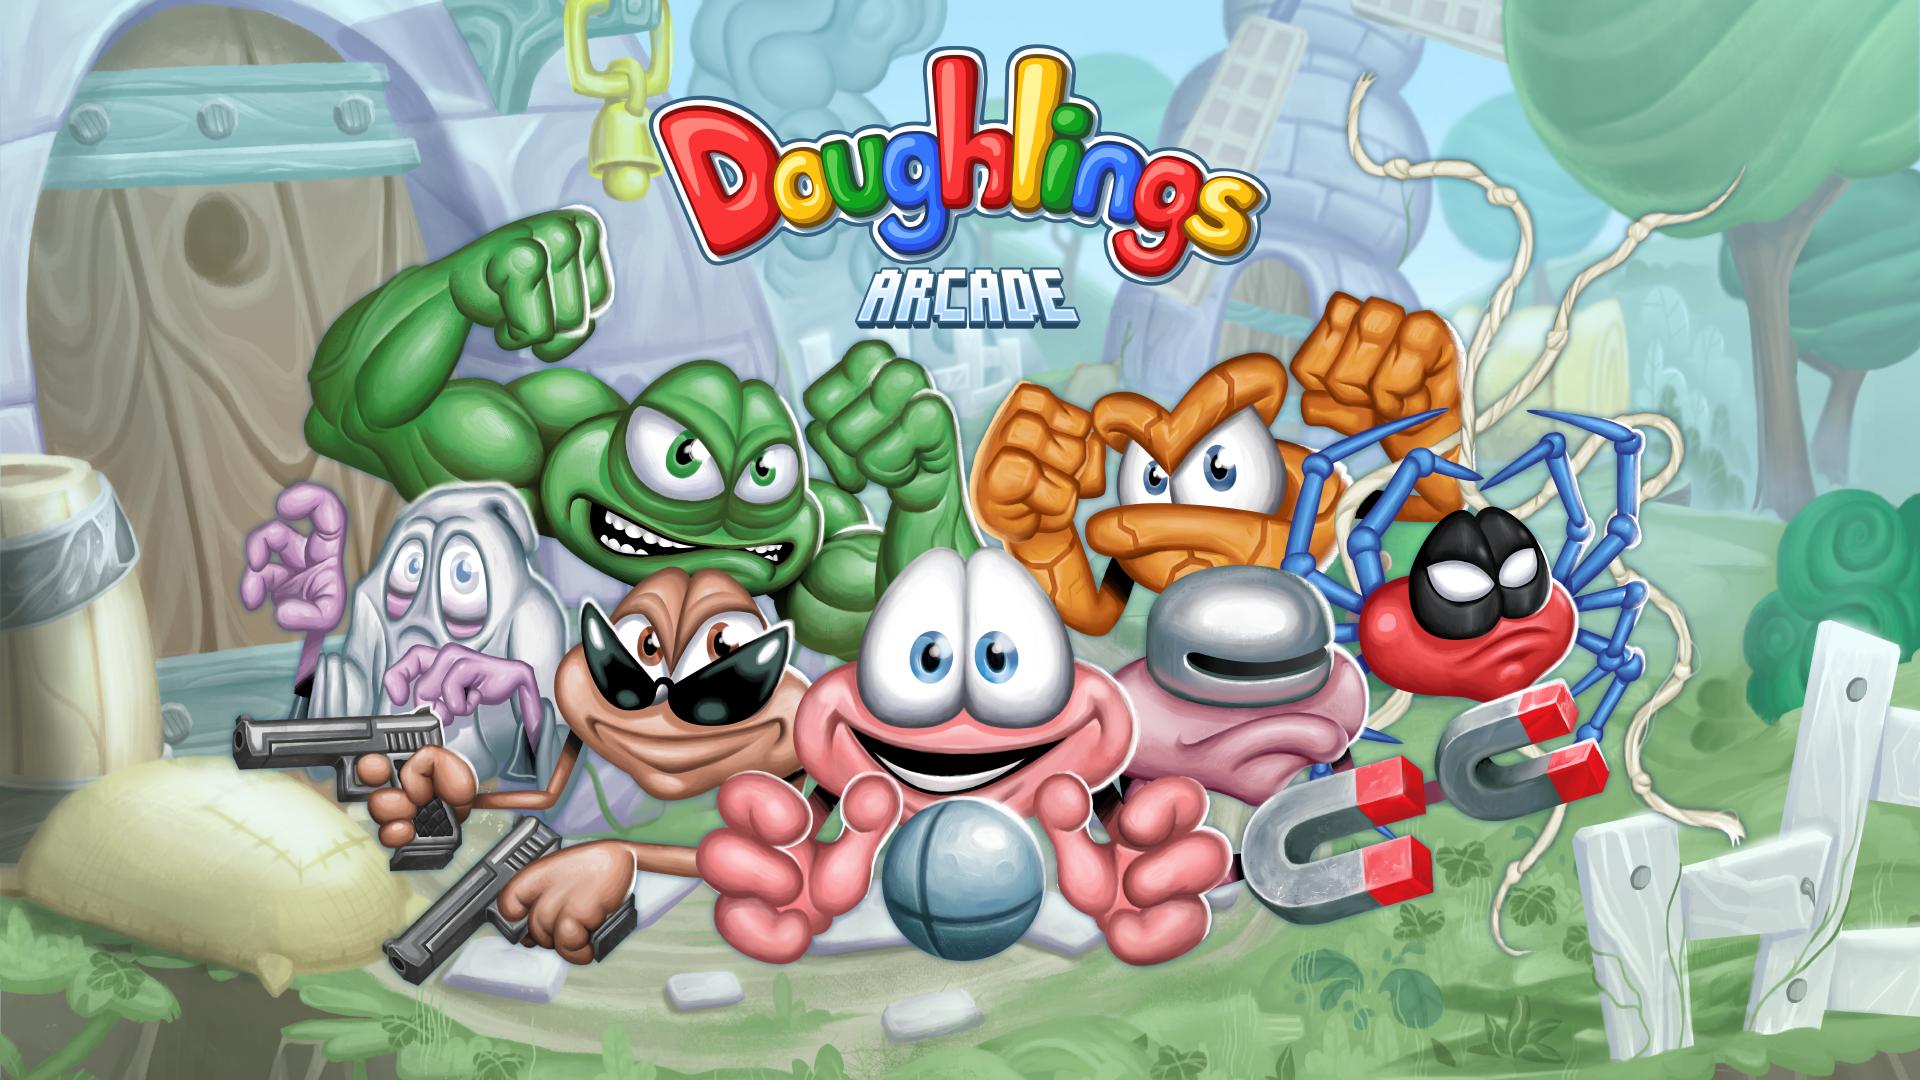 doughlings arcade title